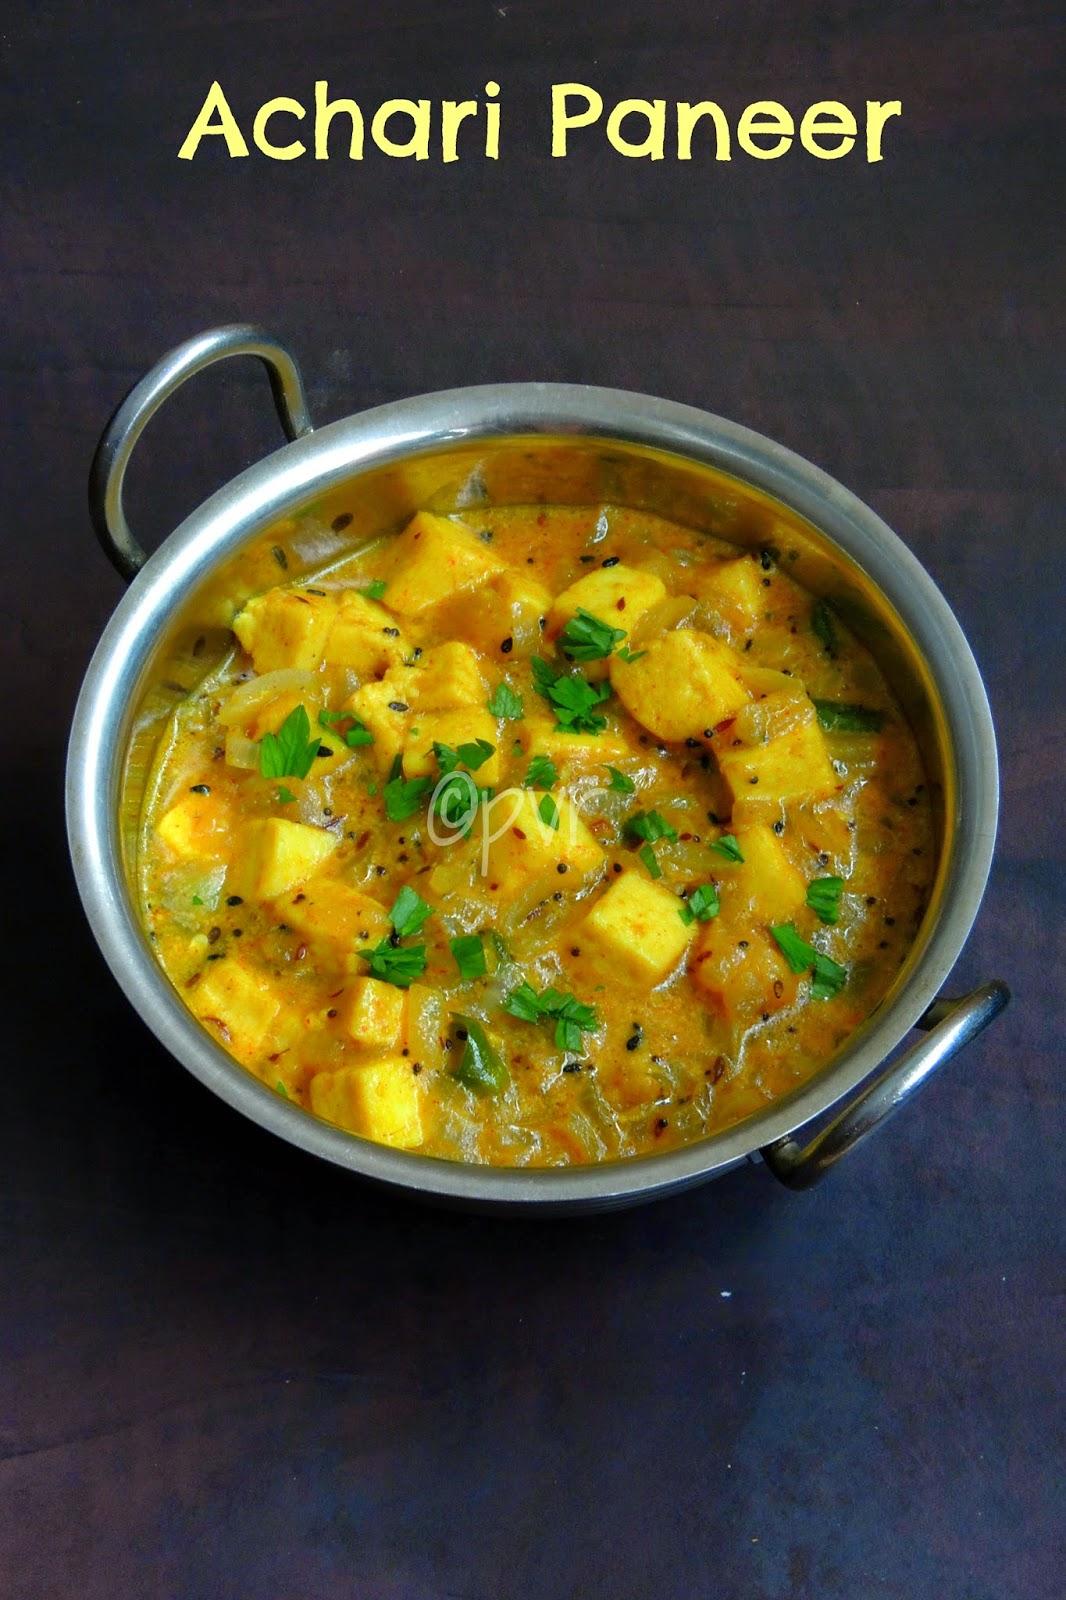 Achari Paneer, Paneer with pickling spices